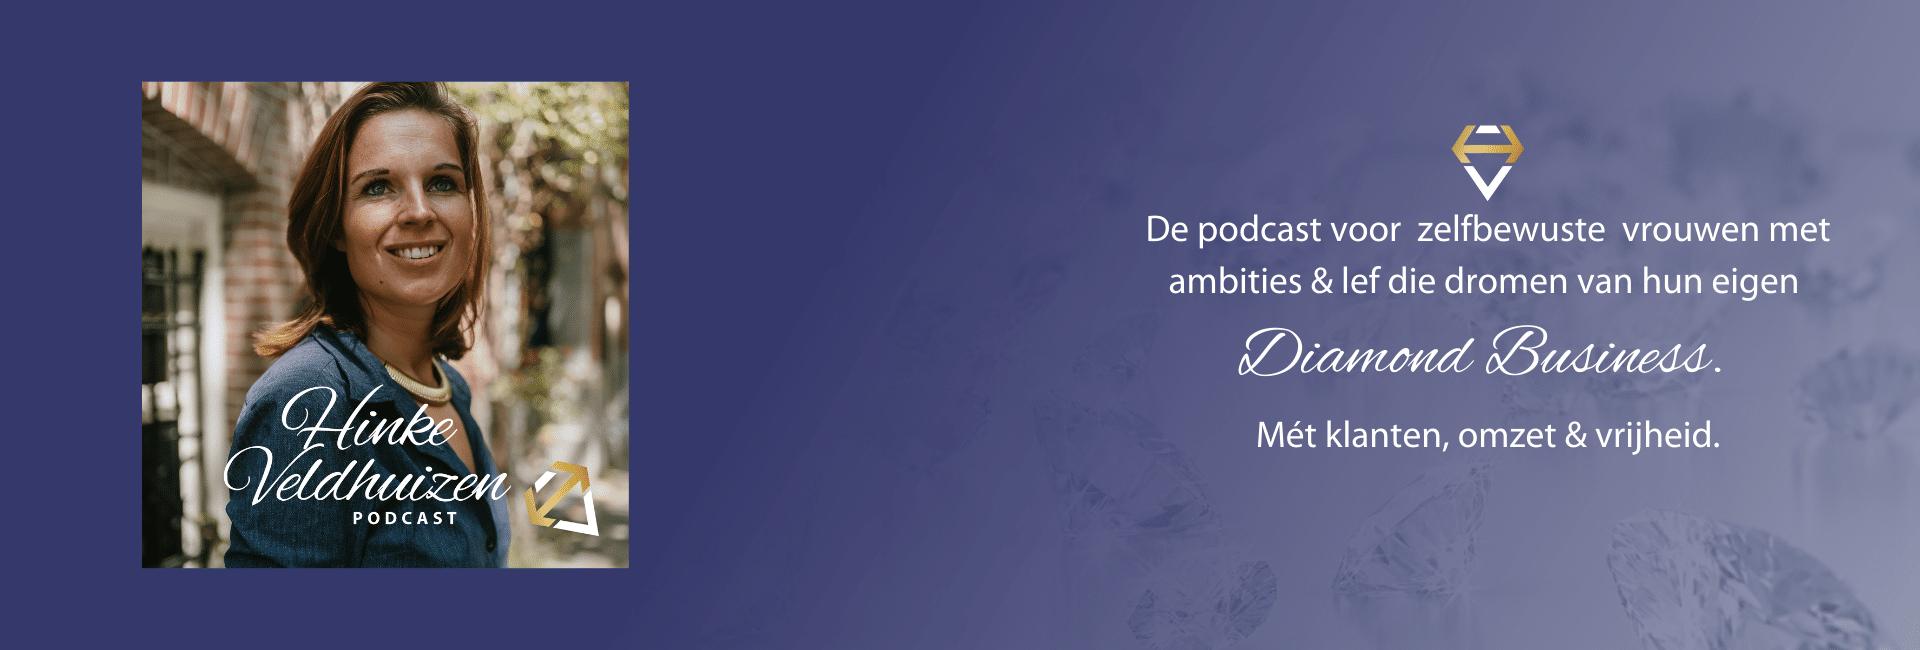 Hinke Veldhuizen Podcast